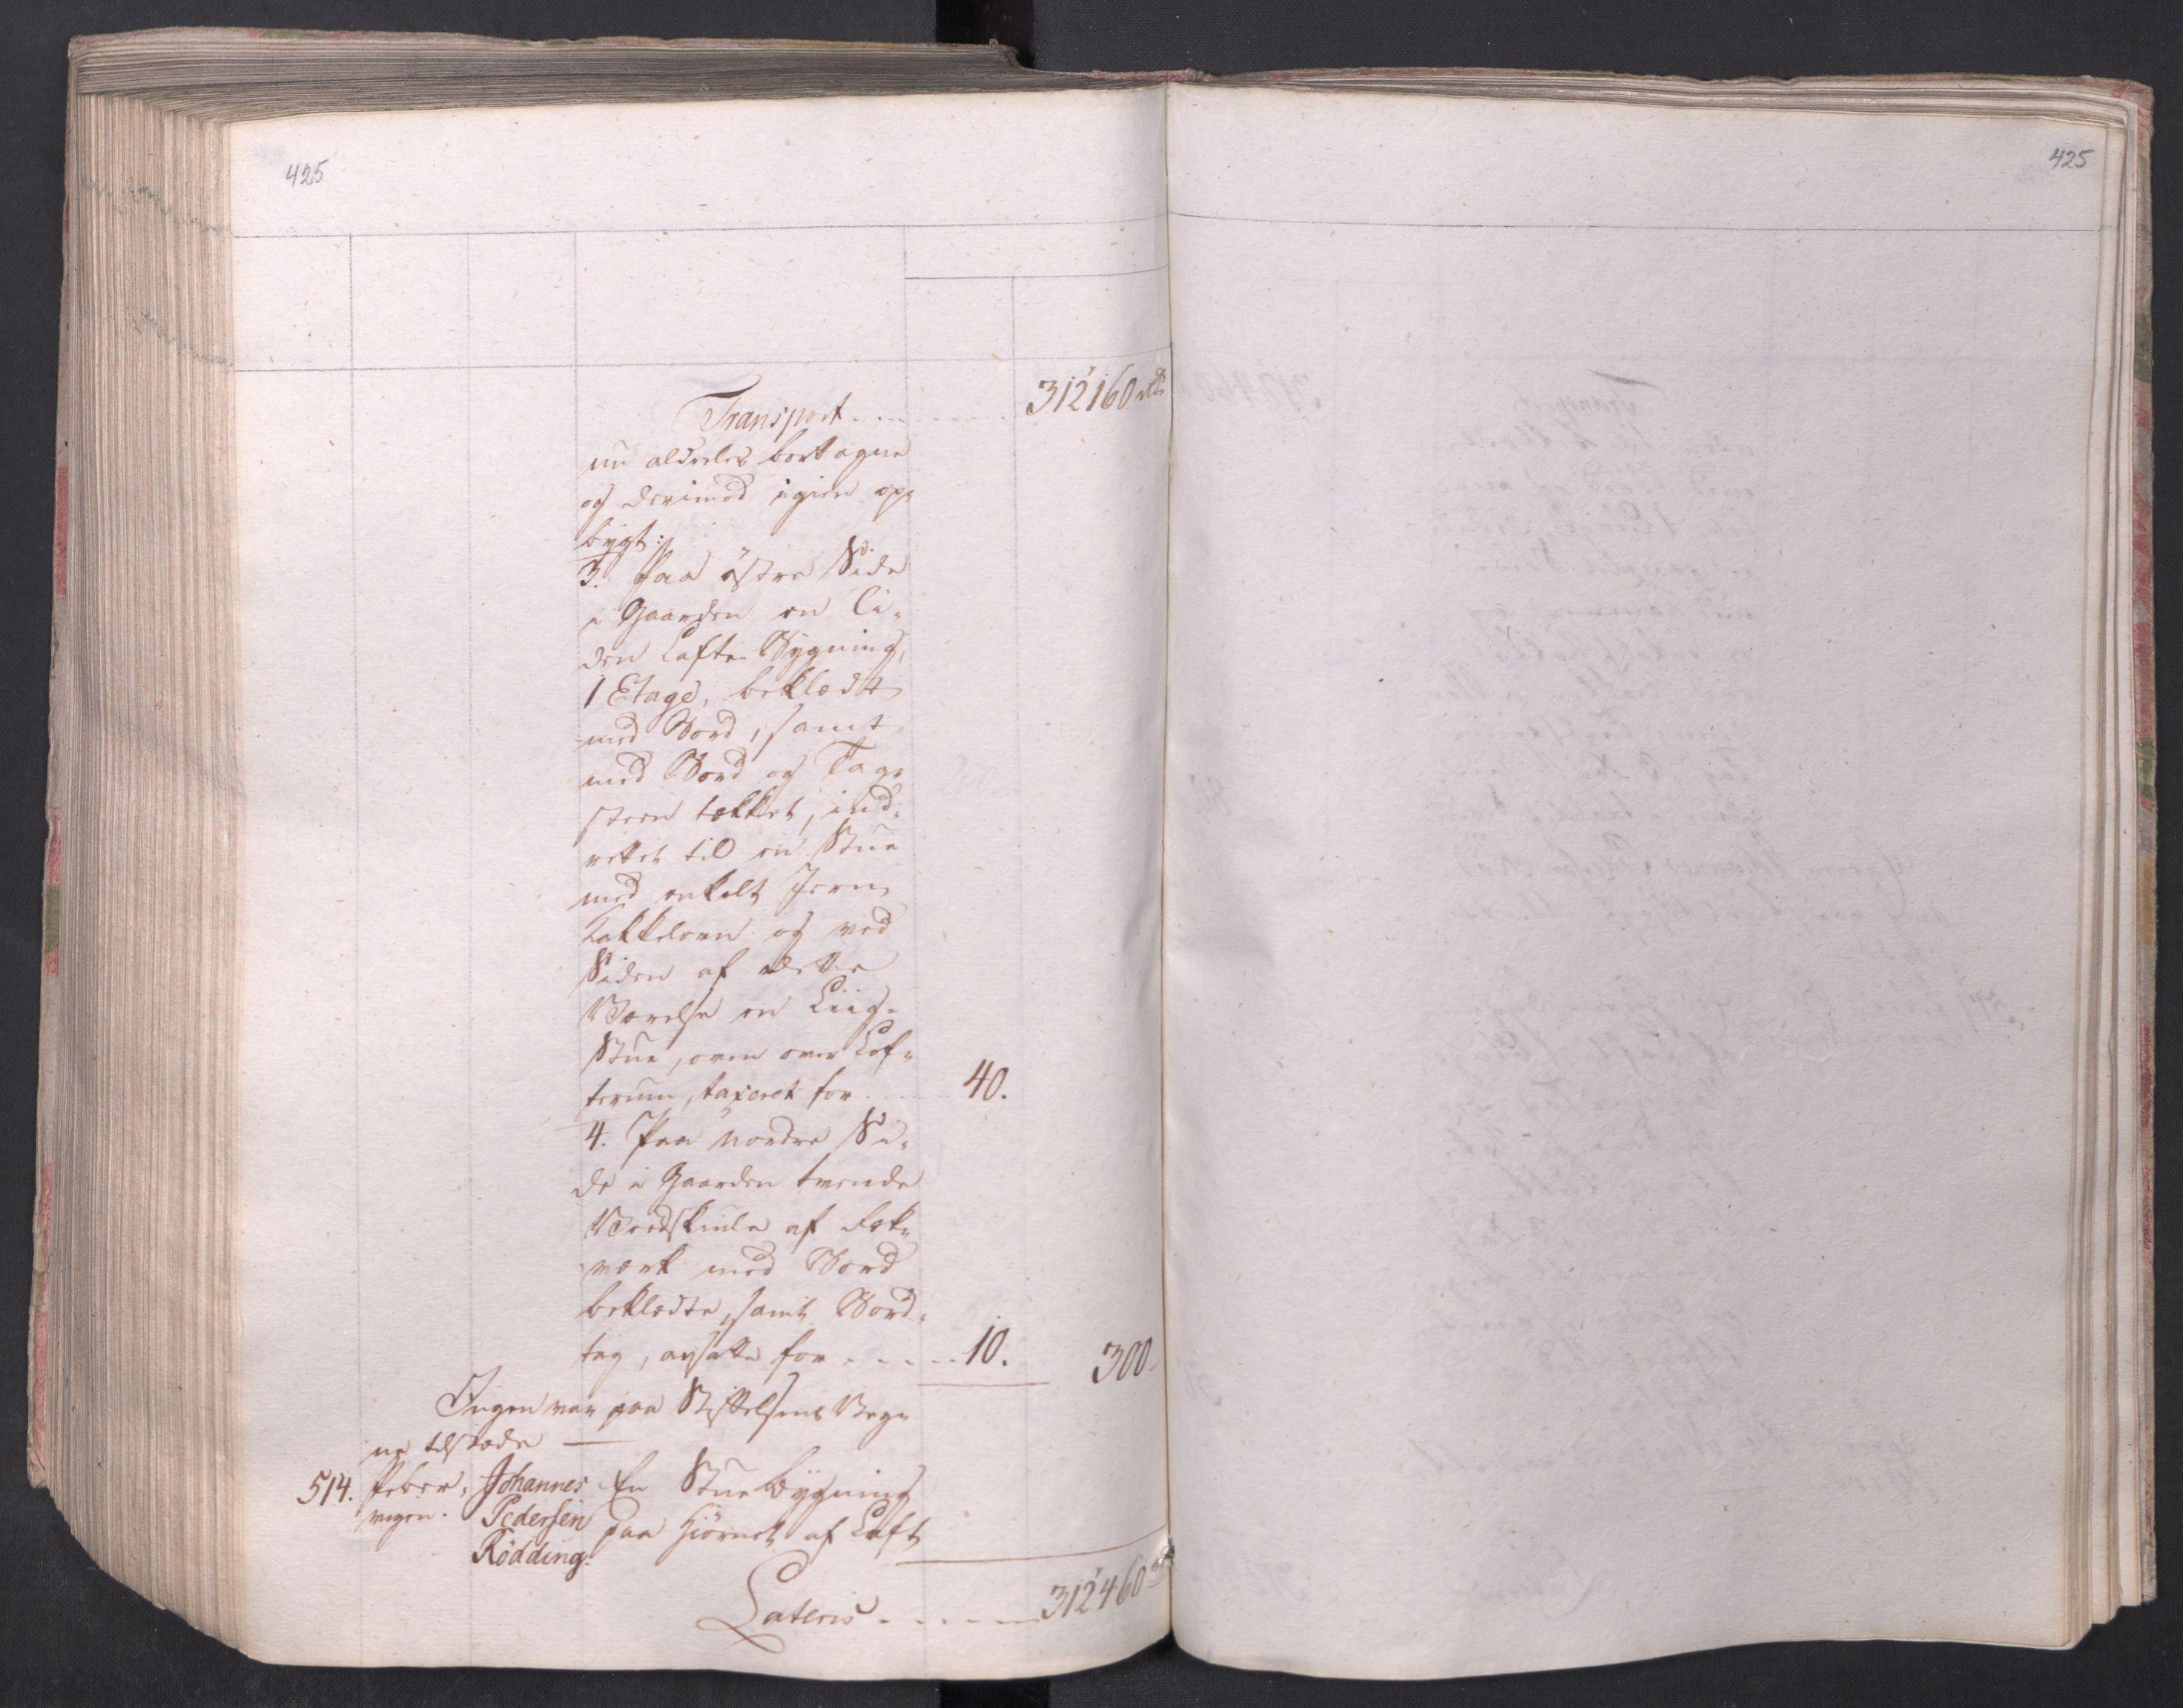 SAO, Kristiania stiftamt, I/Ia/L0015: Branntakster, 1797, s. 425